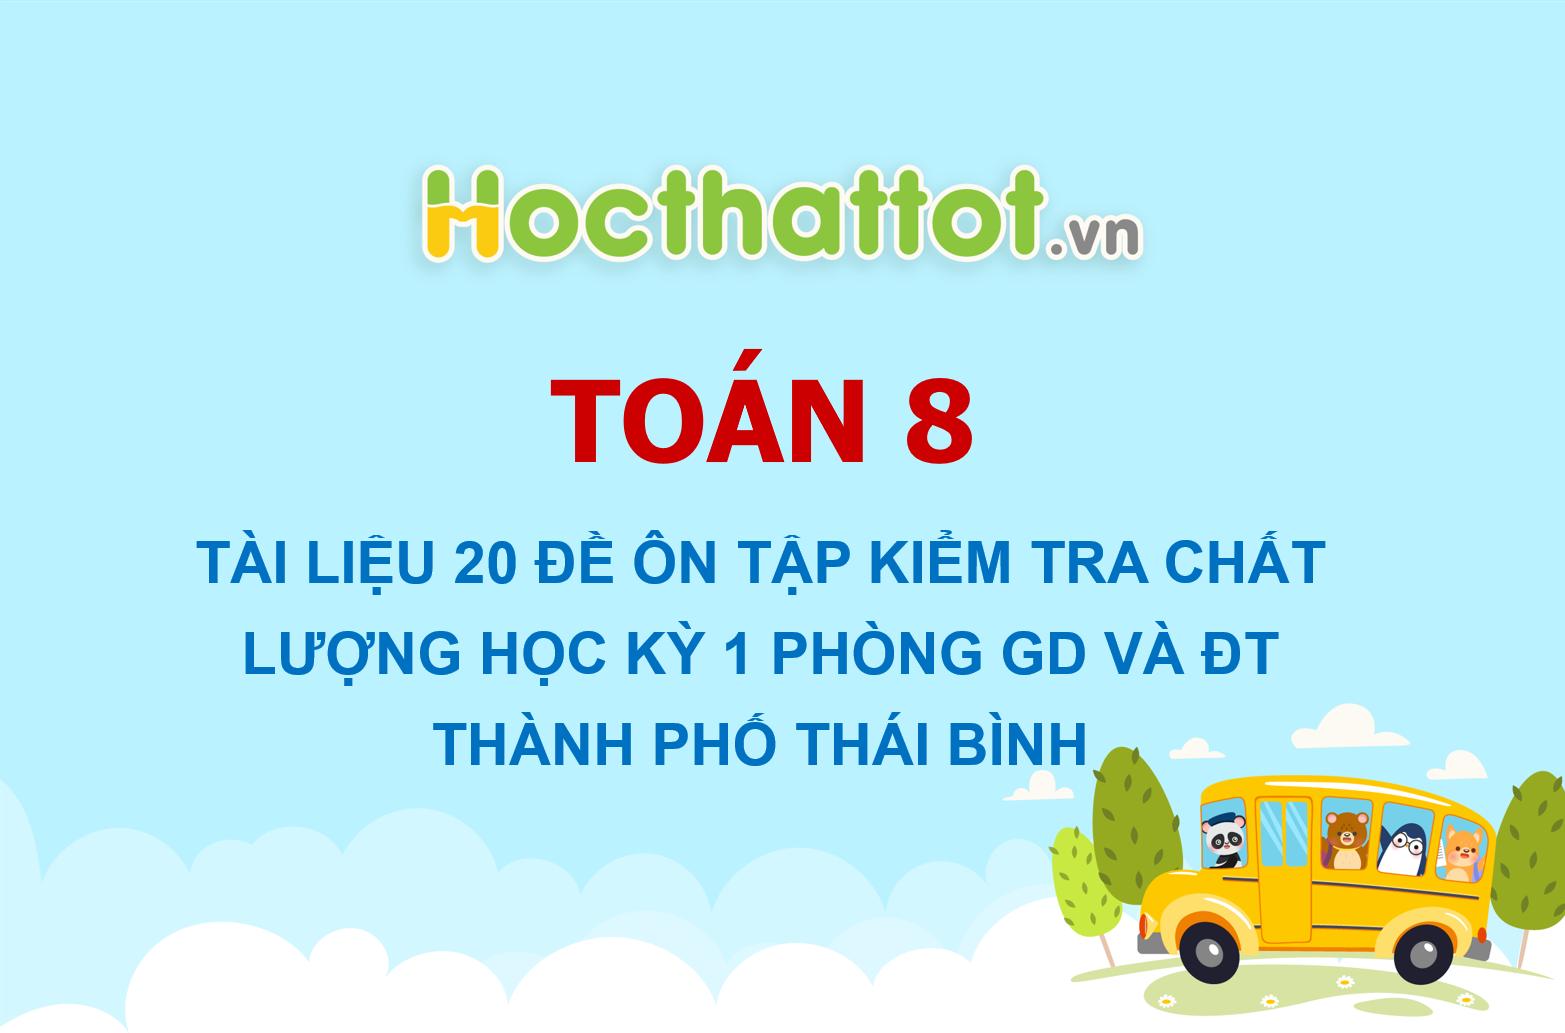 20-de-on-tap-kiem-tra-chat-luong-hoc-ky-1-toan-8-phong-gd-va-dt-thanh-pho-thai-binh